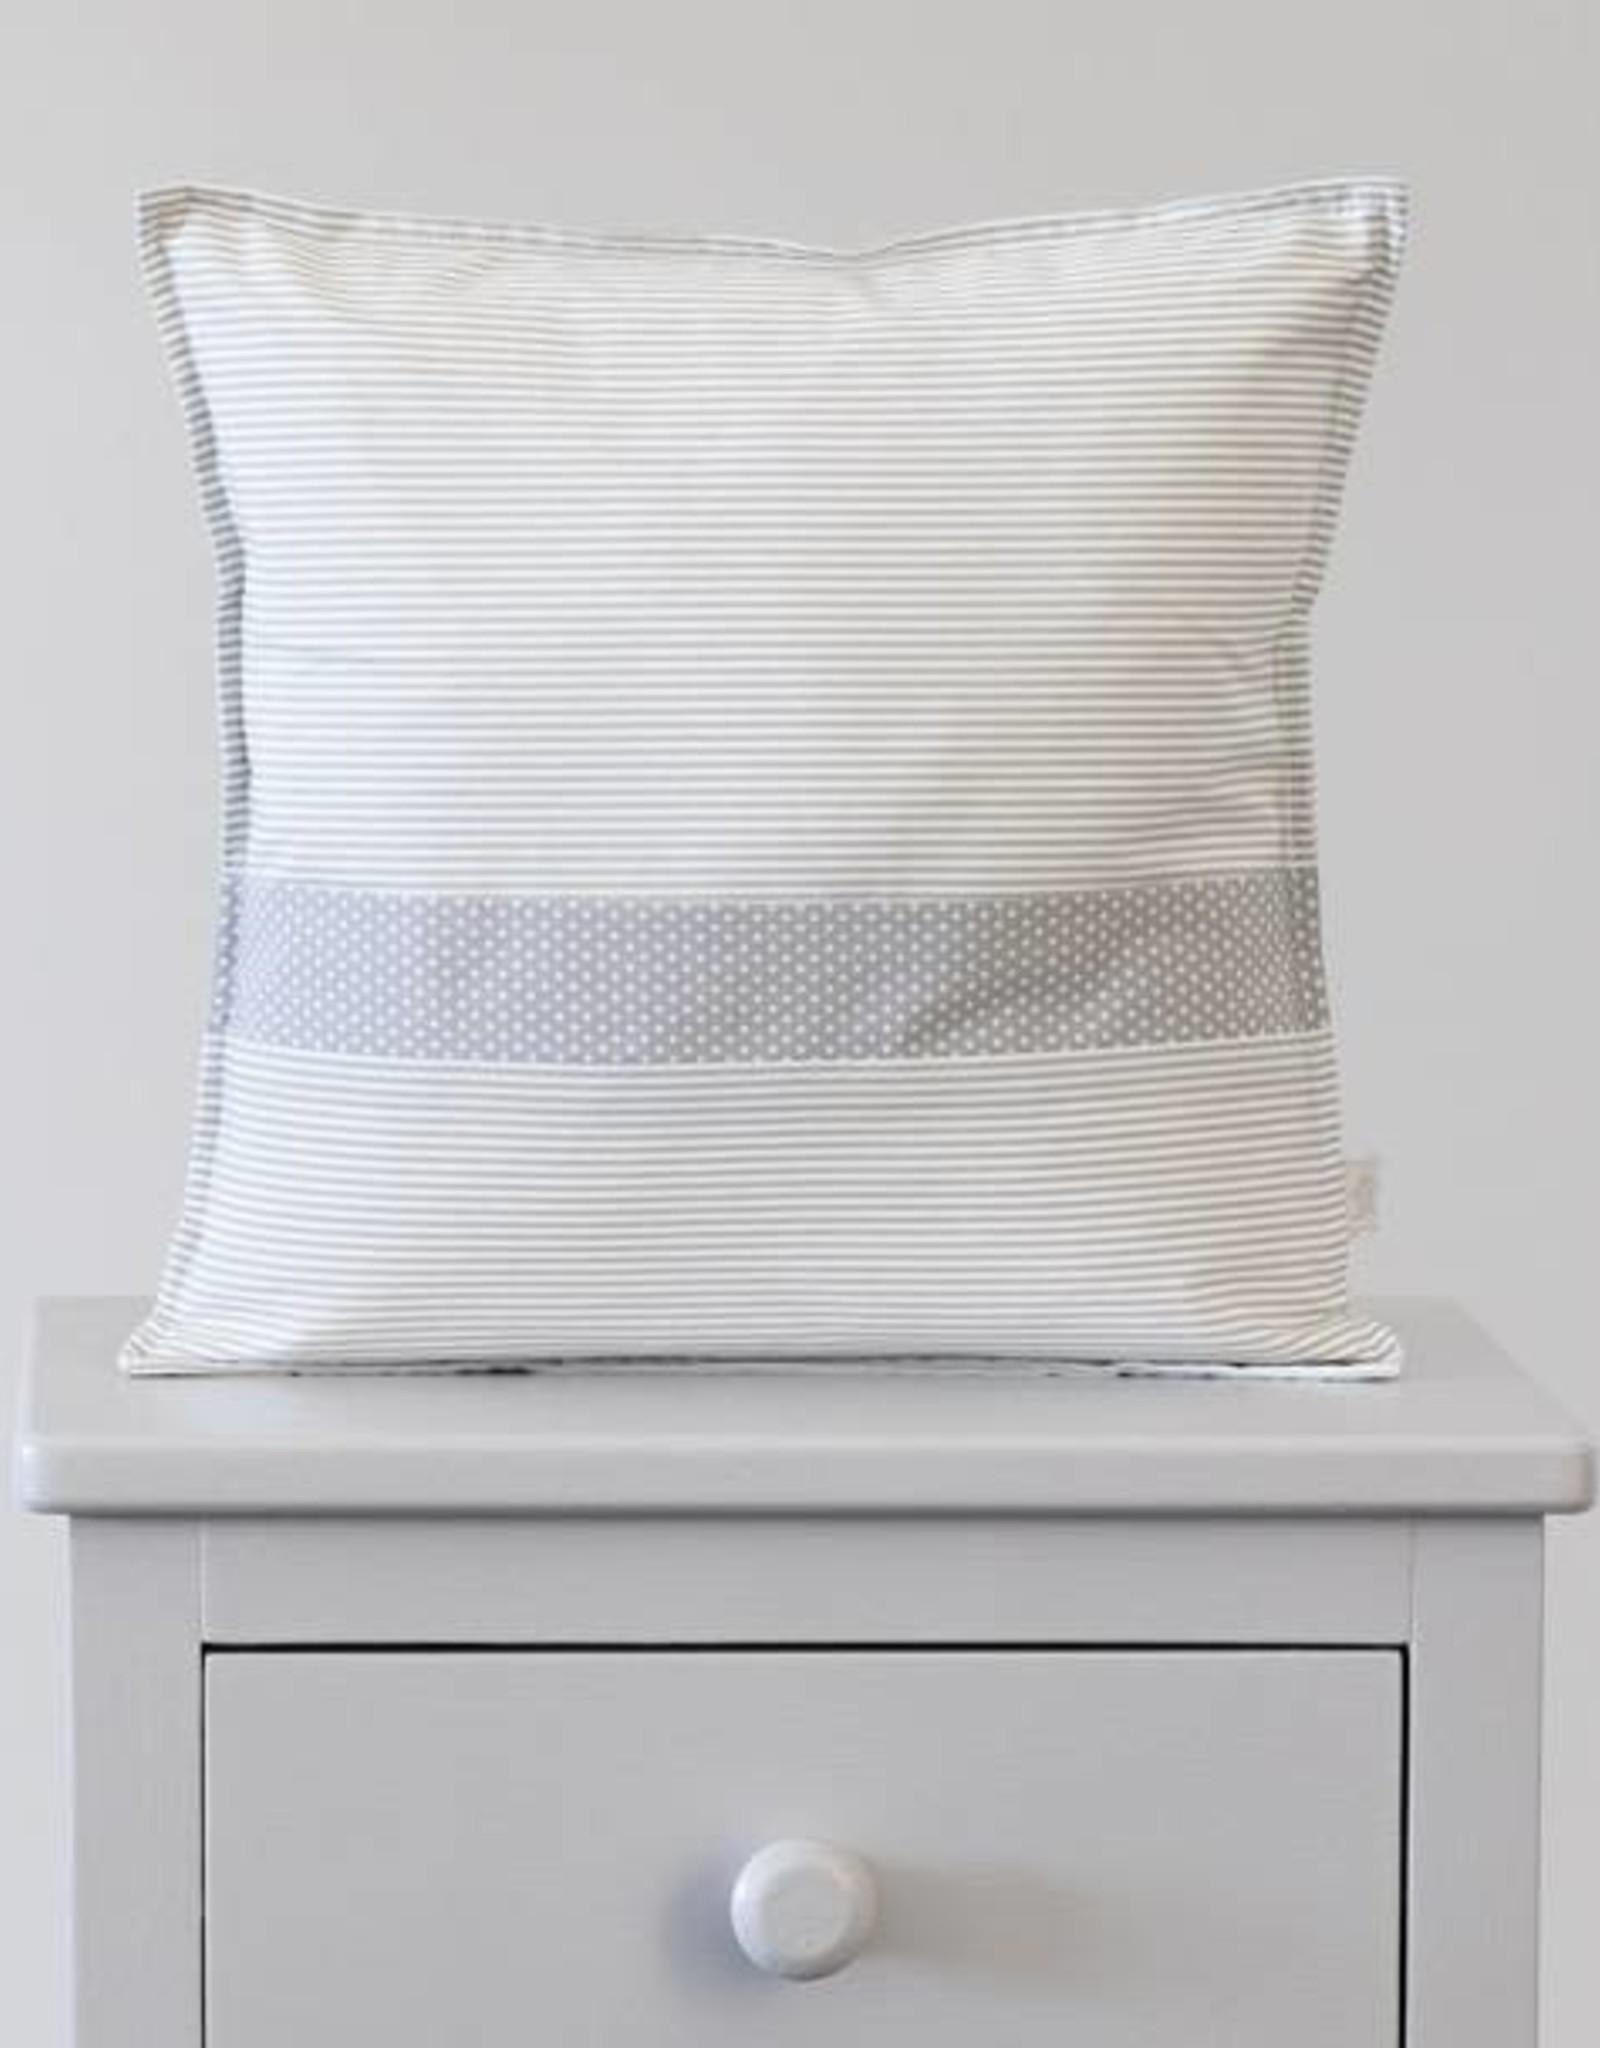 Bouton Jaune Pillowcase and pillow